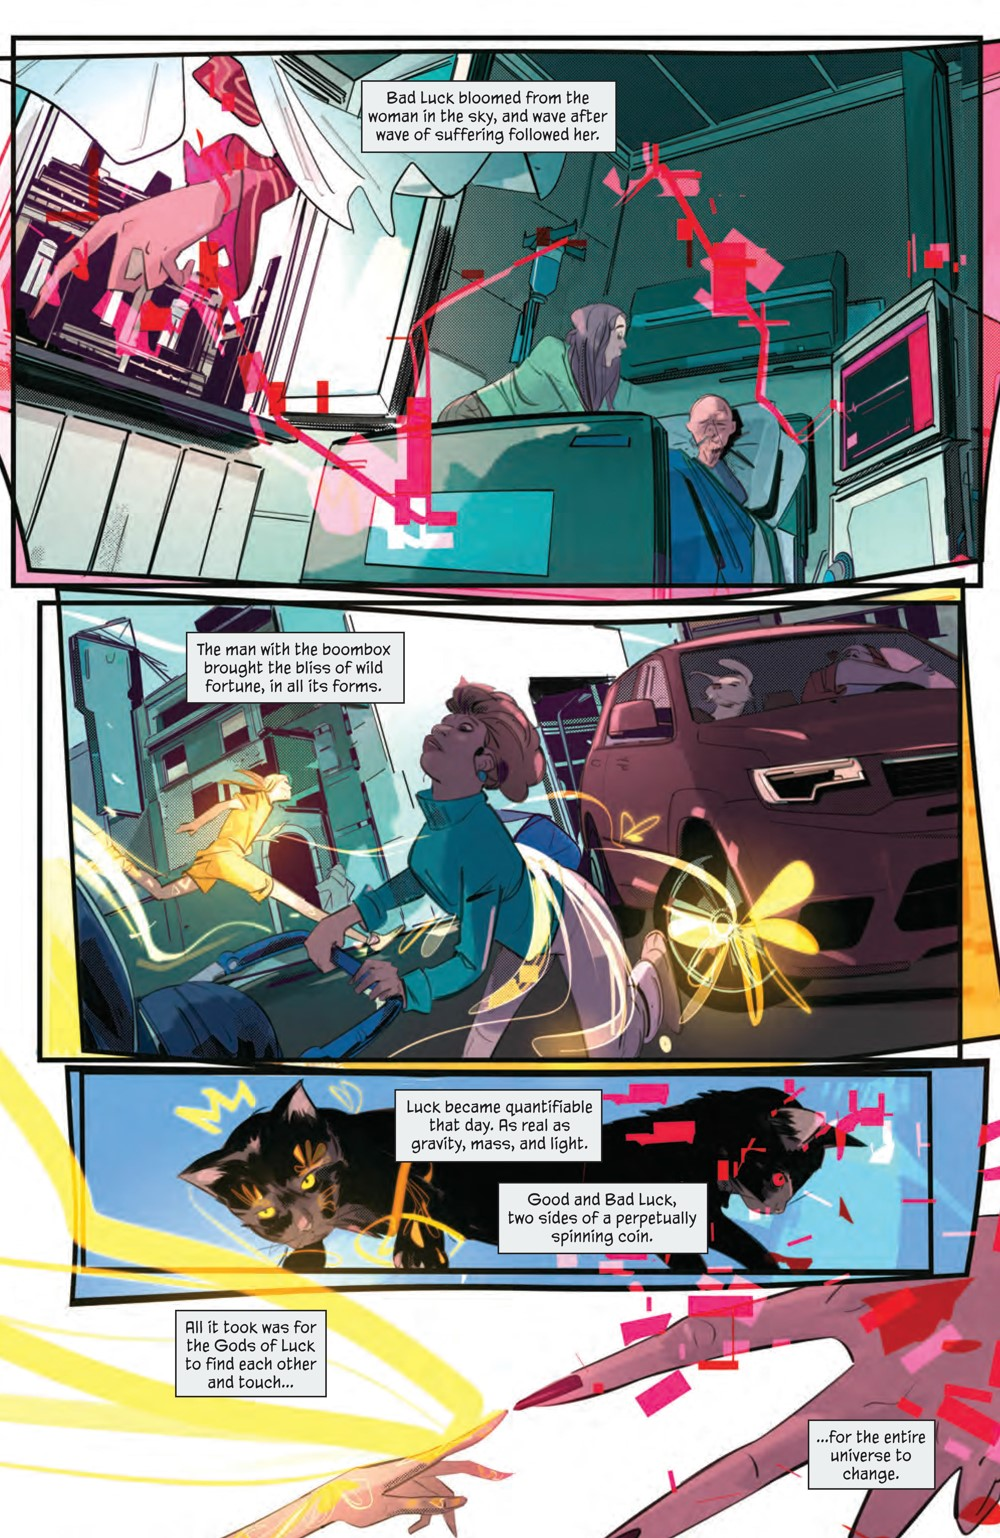 GoodLuck_001_PRESS_5 ComicList Previews: GOOD LUCK #1 (OF 5)